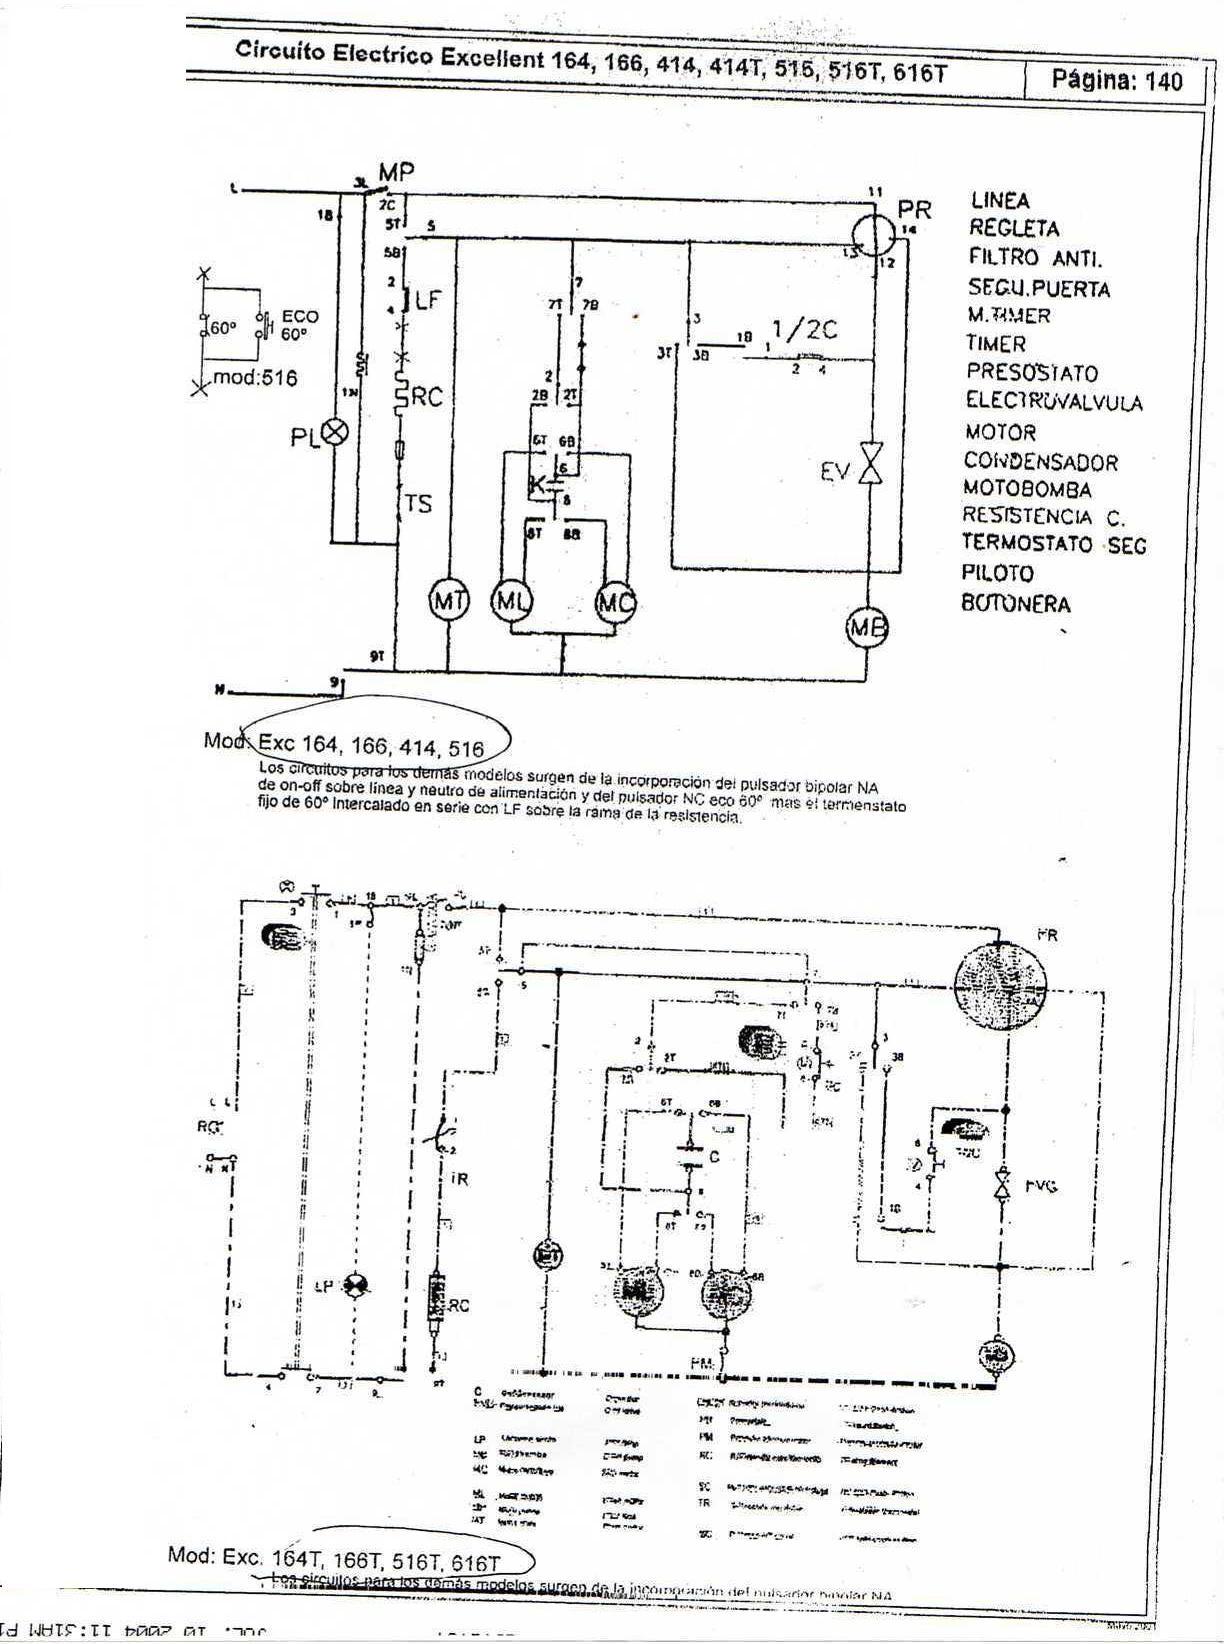 daikin vrv service manual download